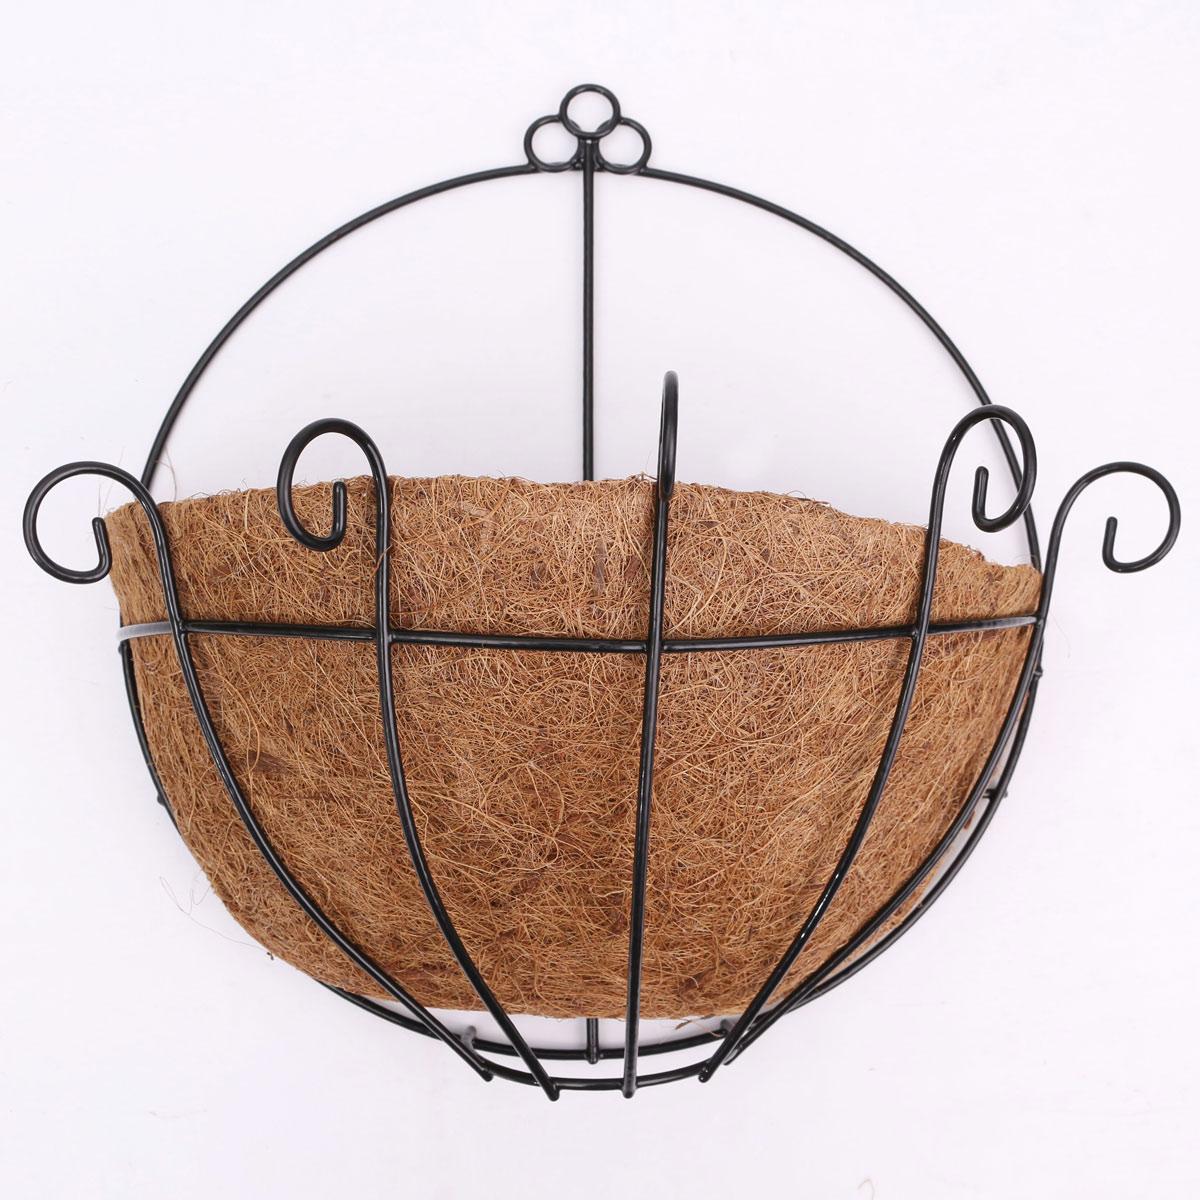 Country Garden Style Iron Hanging Flower Basket Window